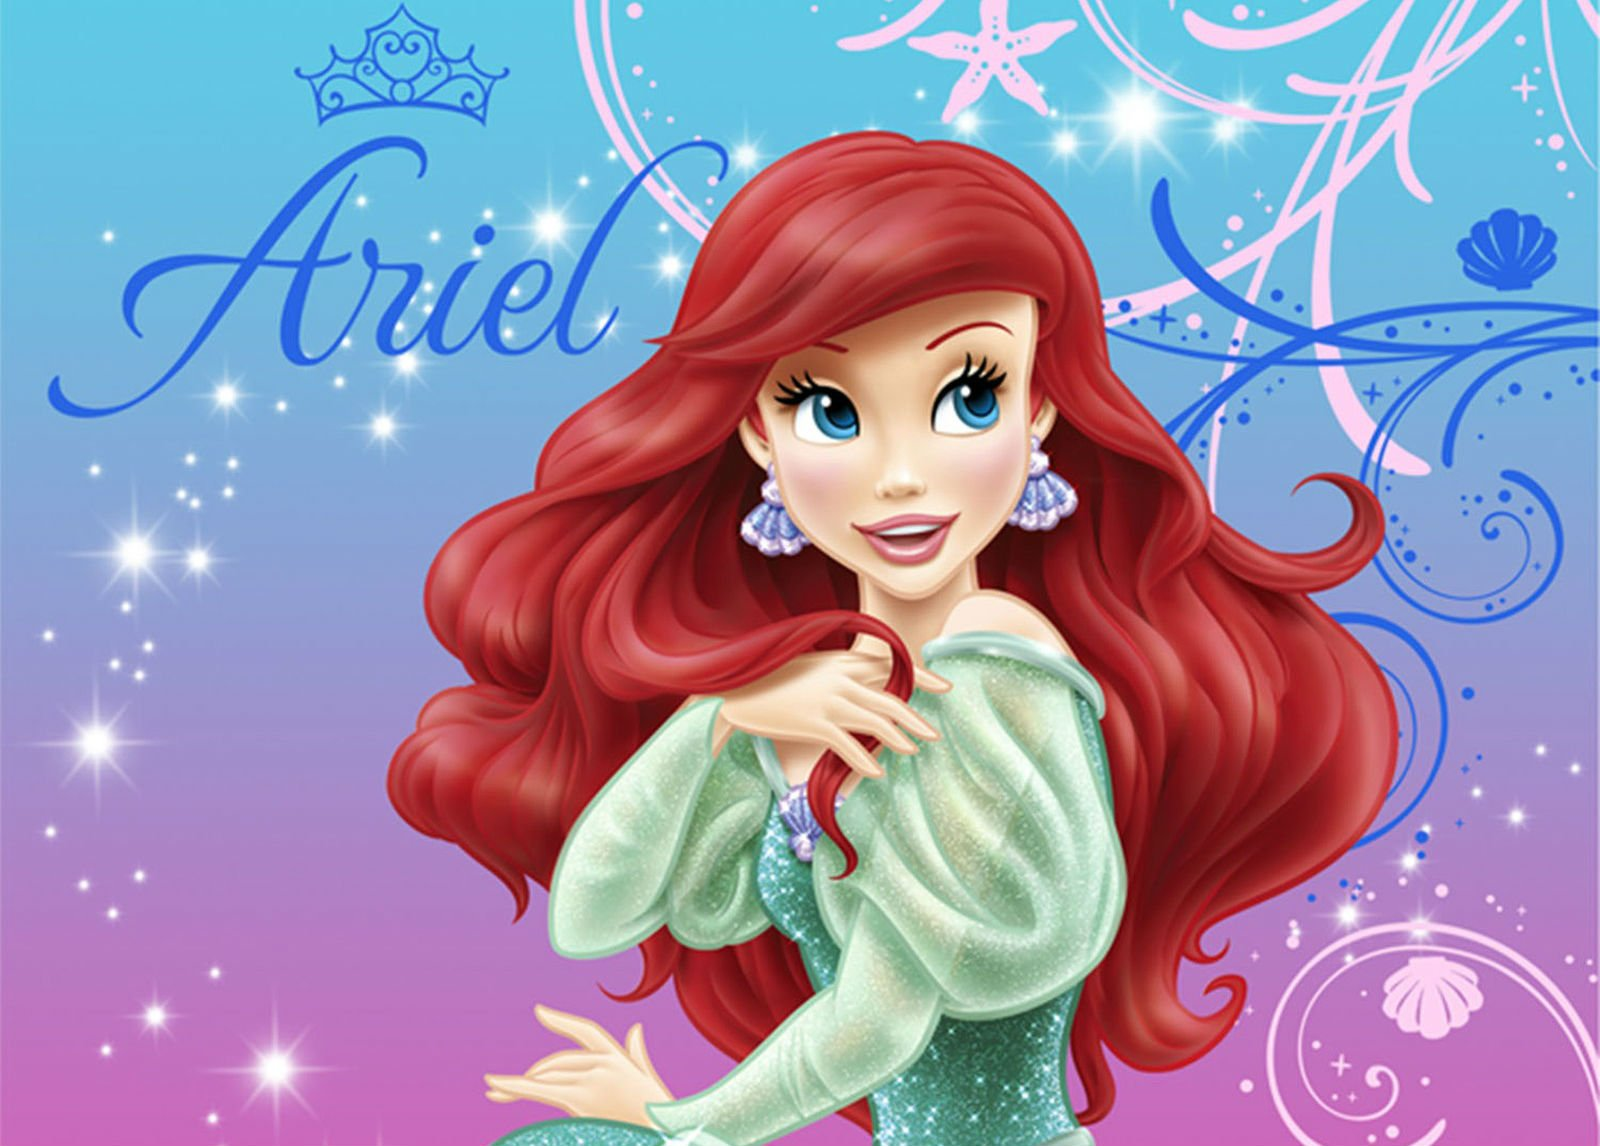 little mermaid disney fantasy animation cartoon adventure family